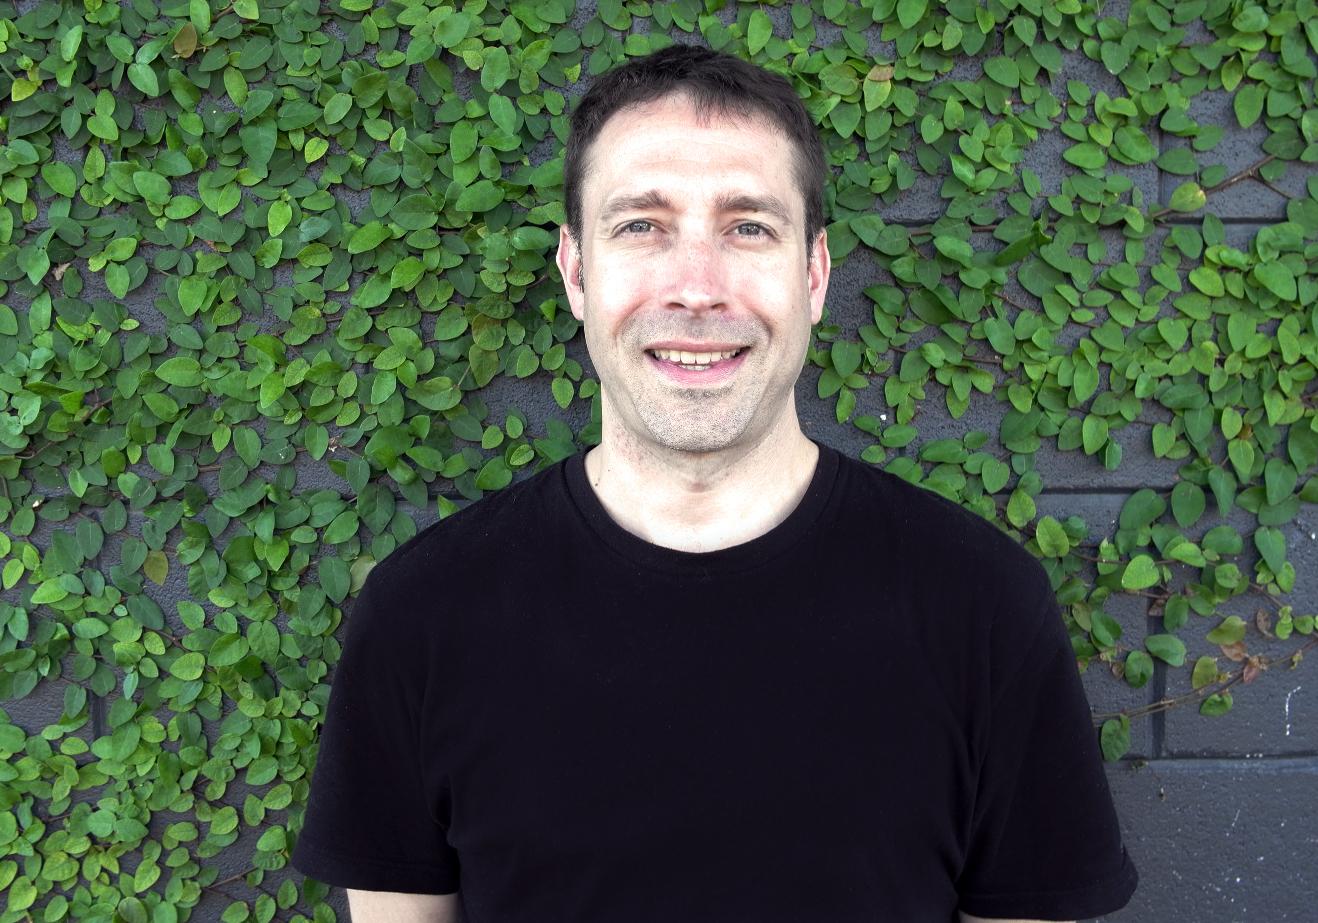 Martin Wilda of Sway